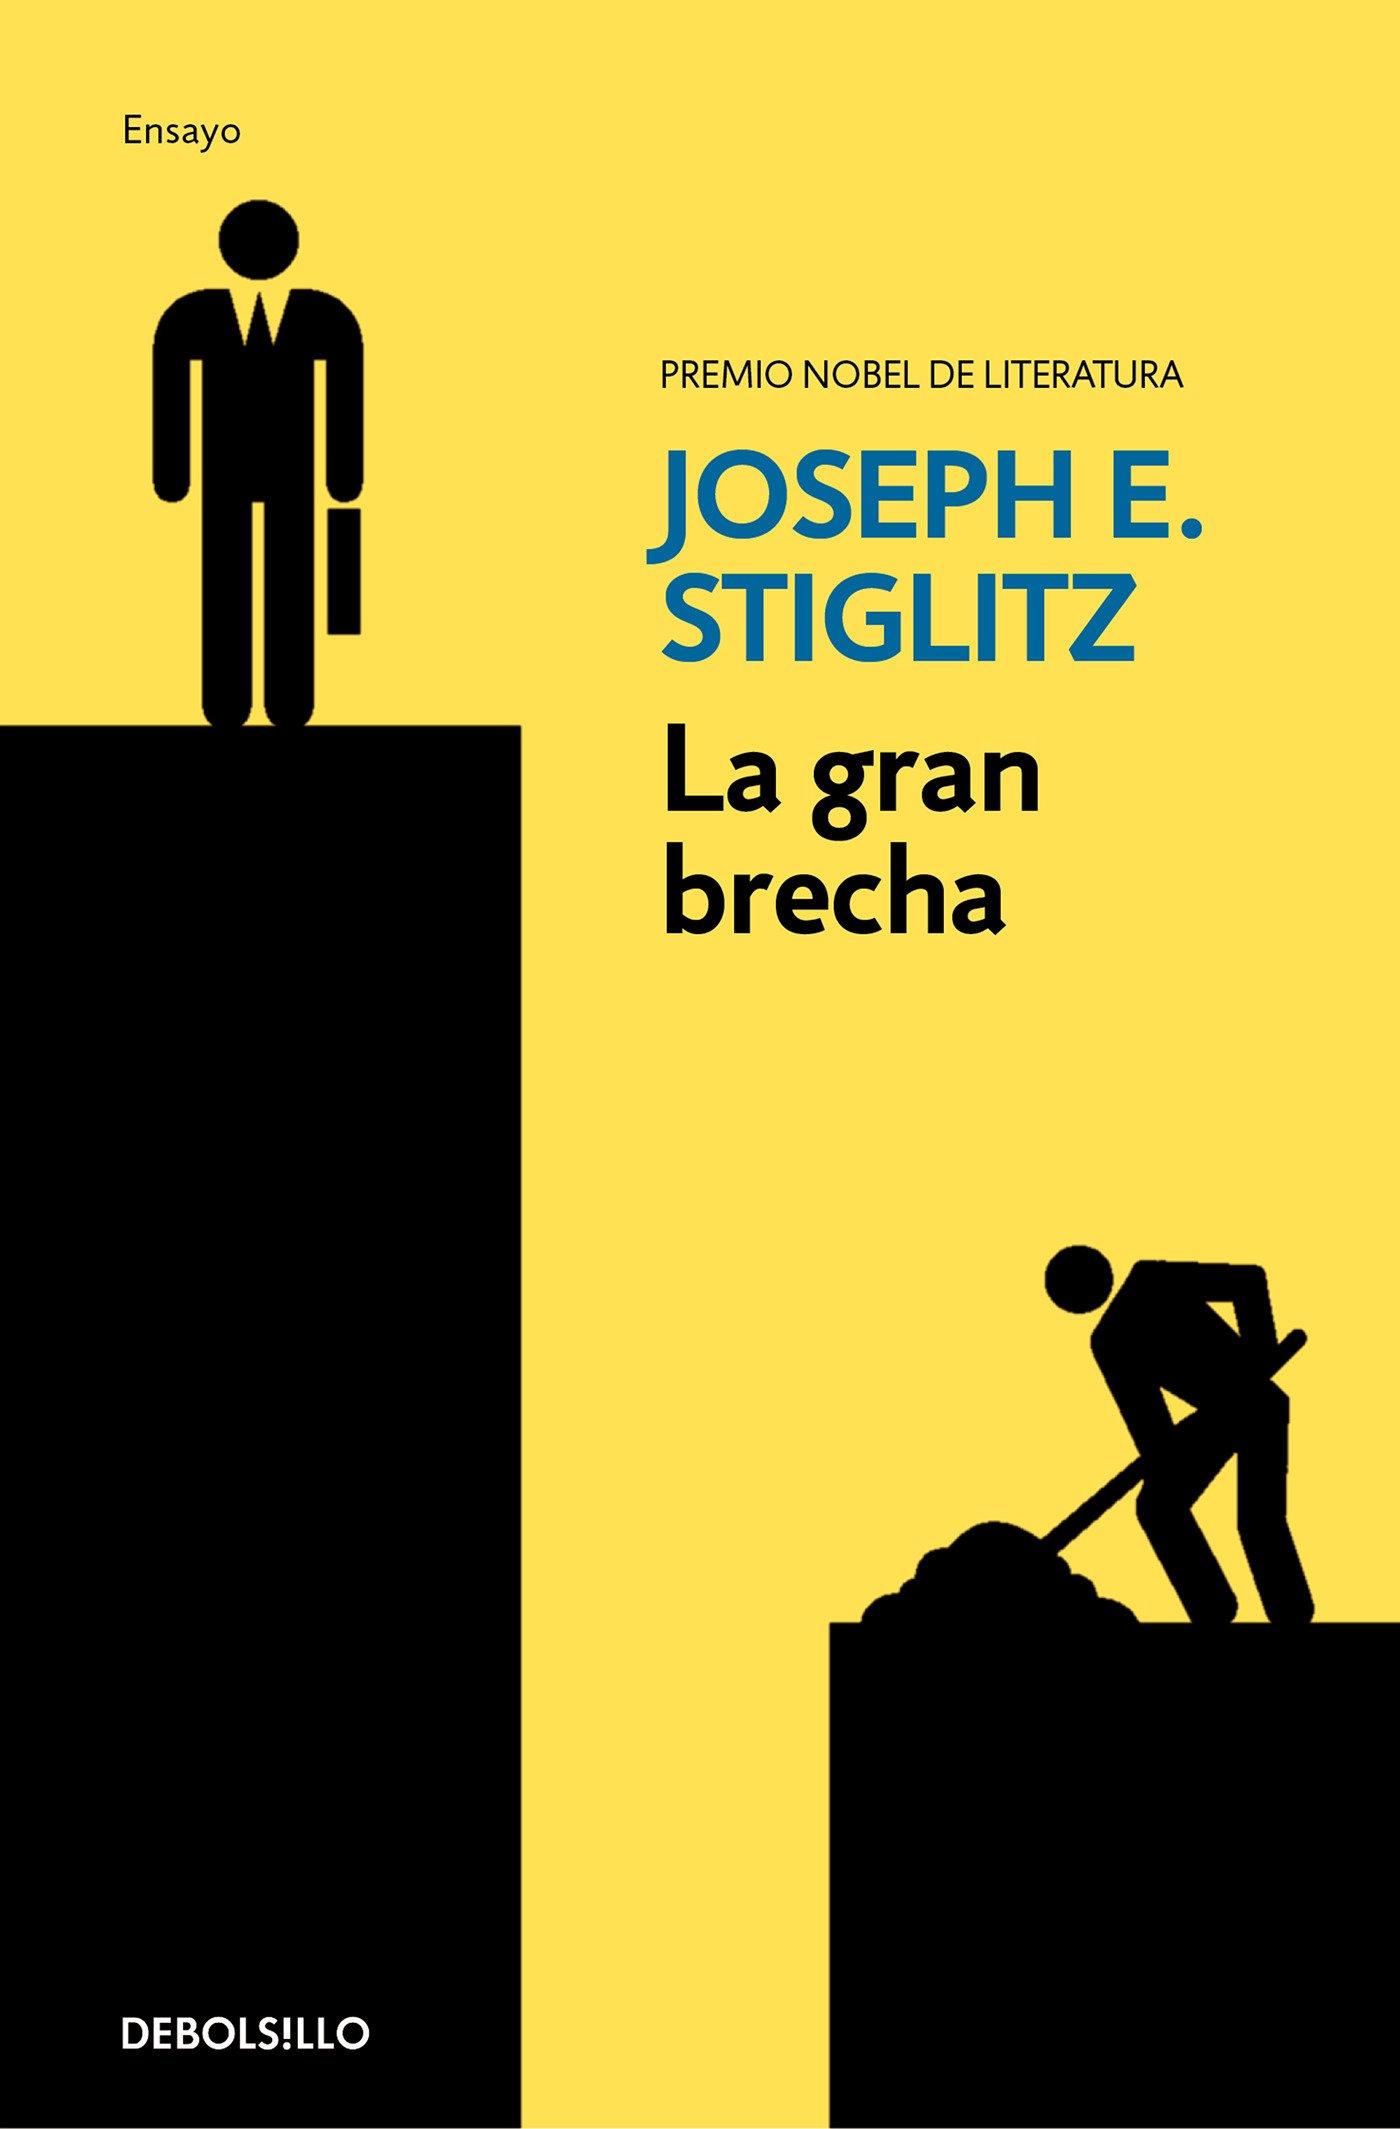 La gran brecha / The great divide: Unequal Societies and What we can do about th em: Que hacer con las sociedades desiguales (Spanish Edition) PDF